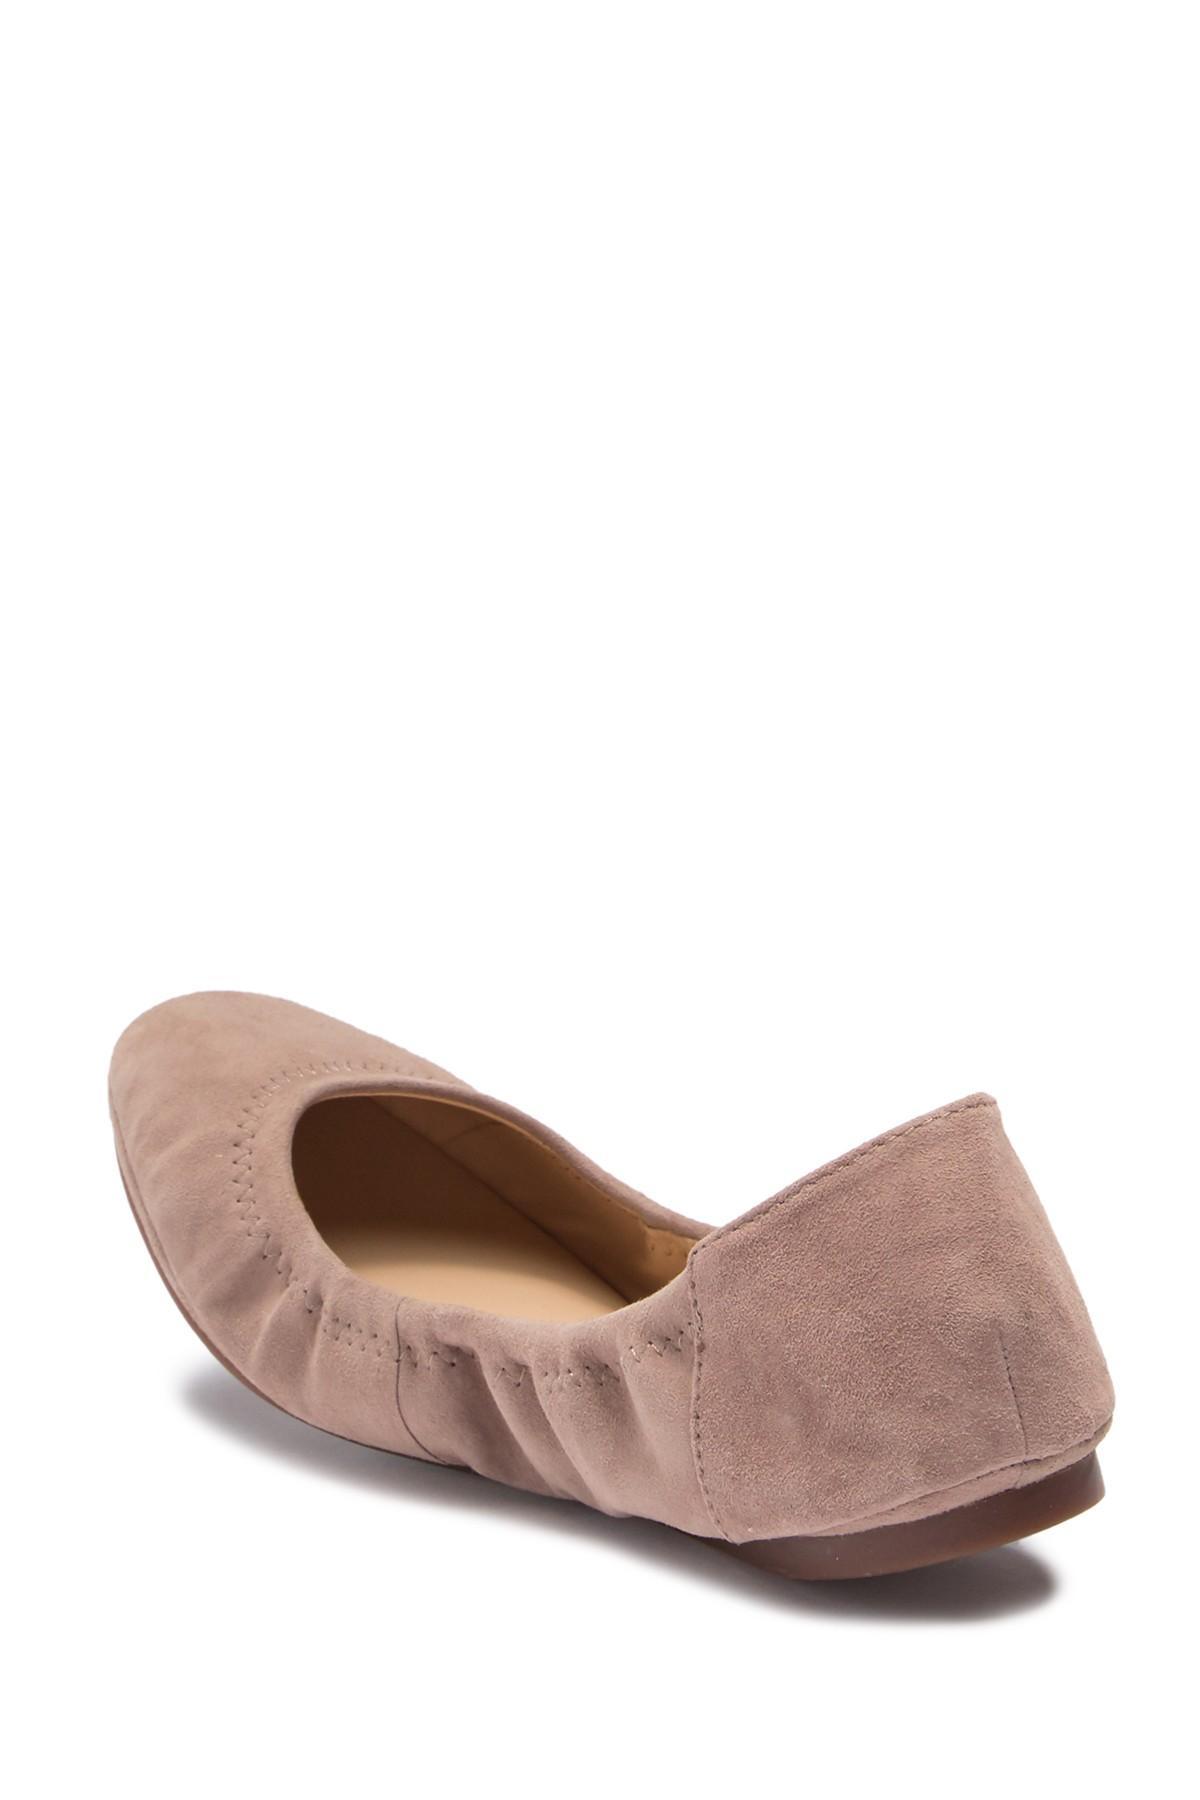 5ebffe72a1f Vince Camuto - Brown Ellen Round Toe Leather Flat - Lyst. View fullscreen